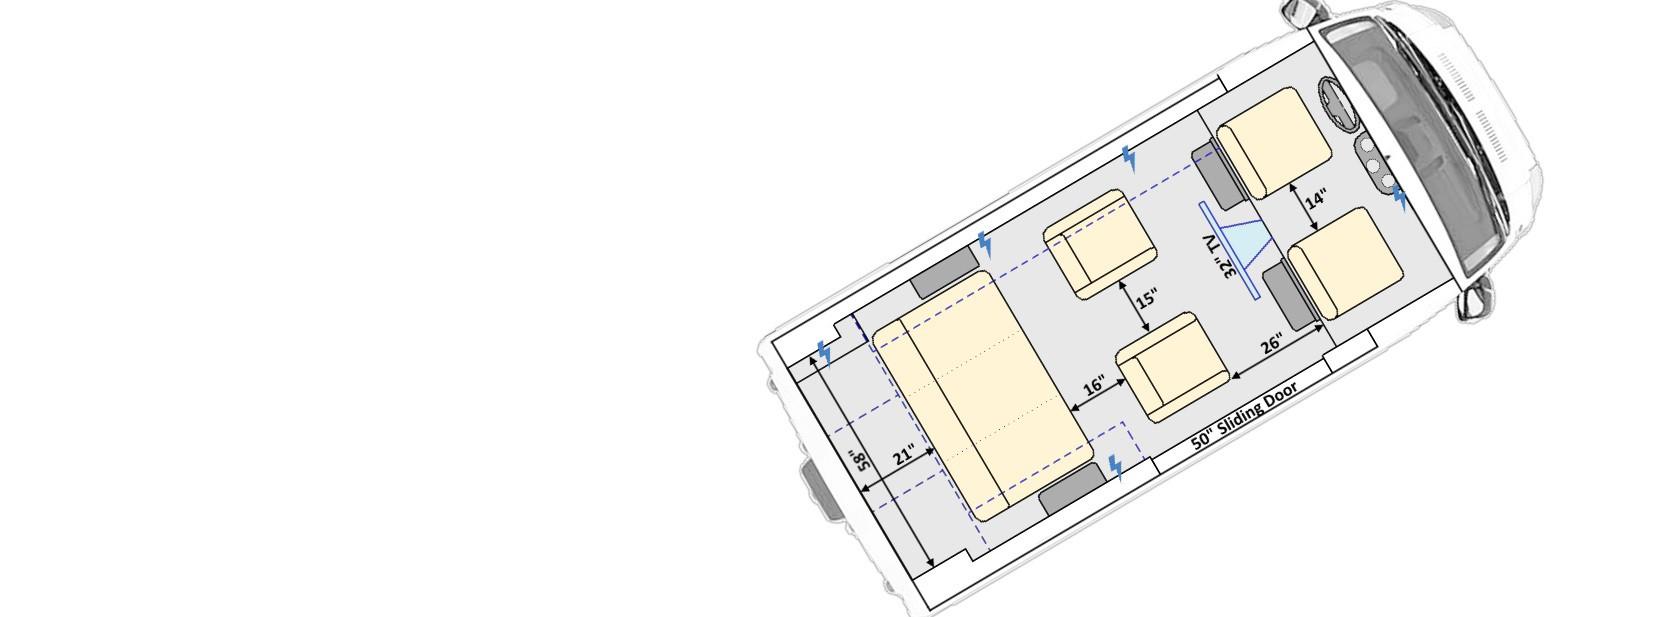 Ram promaster 2500 interior dimensions for Ram promaster city interior dimensions